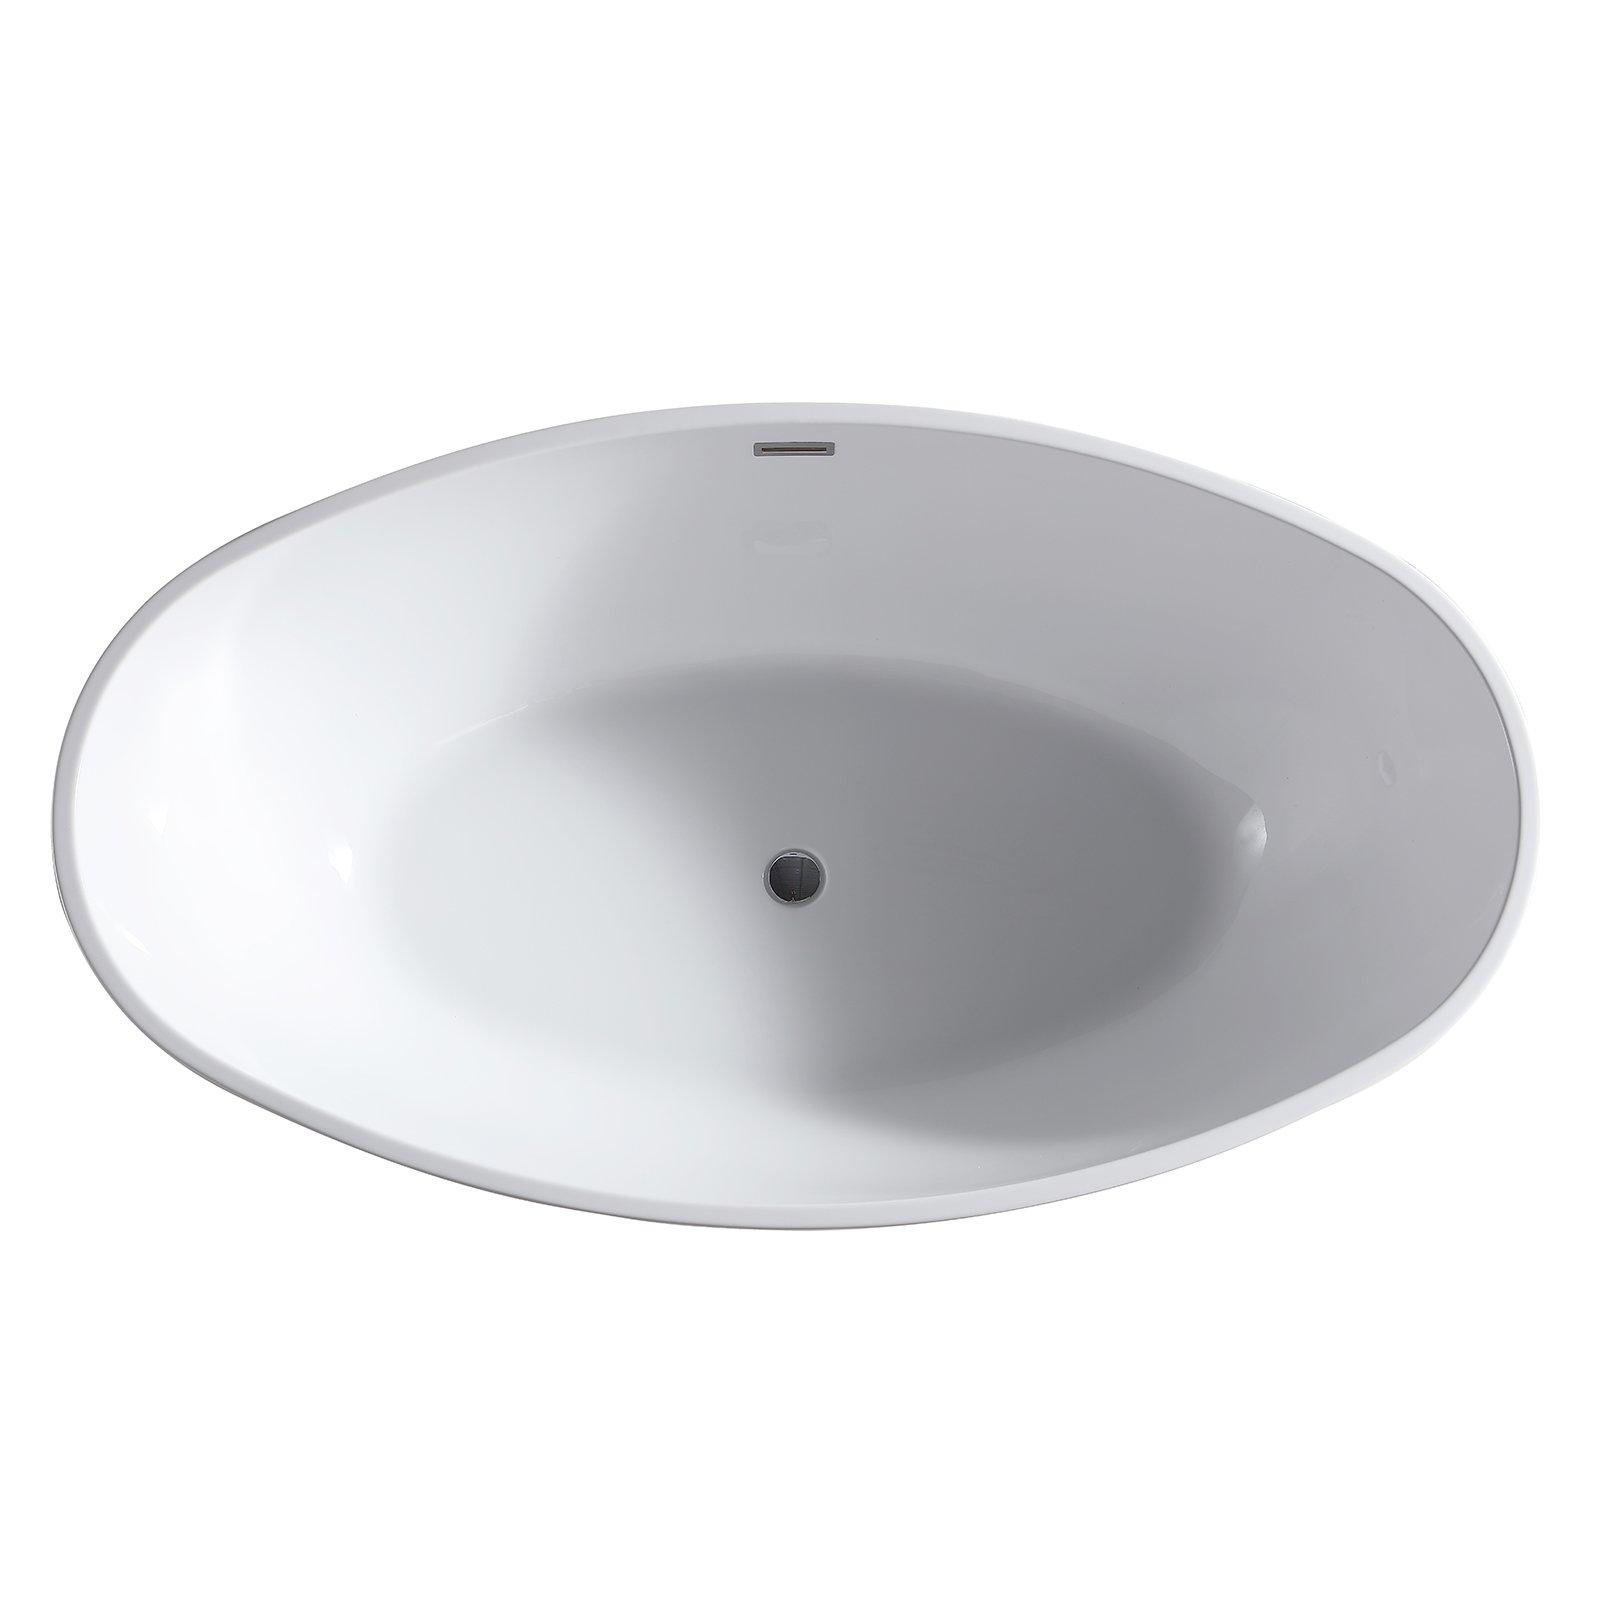 Freistehende Badewanne LEO Acryl Weiß glänzend - 175 x 100 x 58 cm - Standarmatur wählbar zoom thumbnail 3